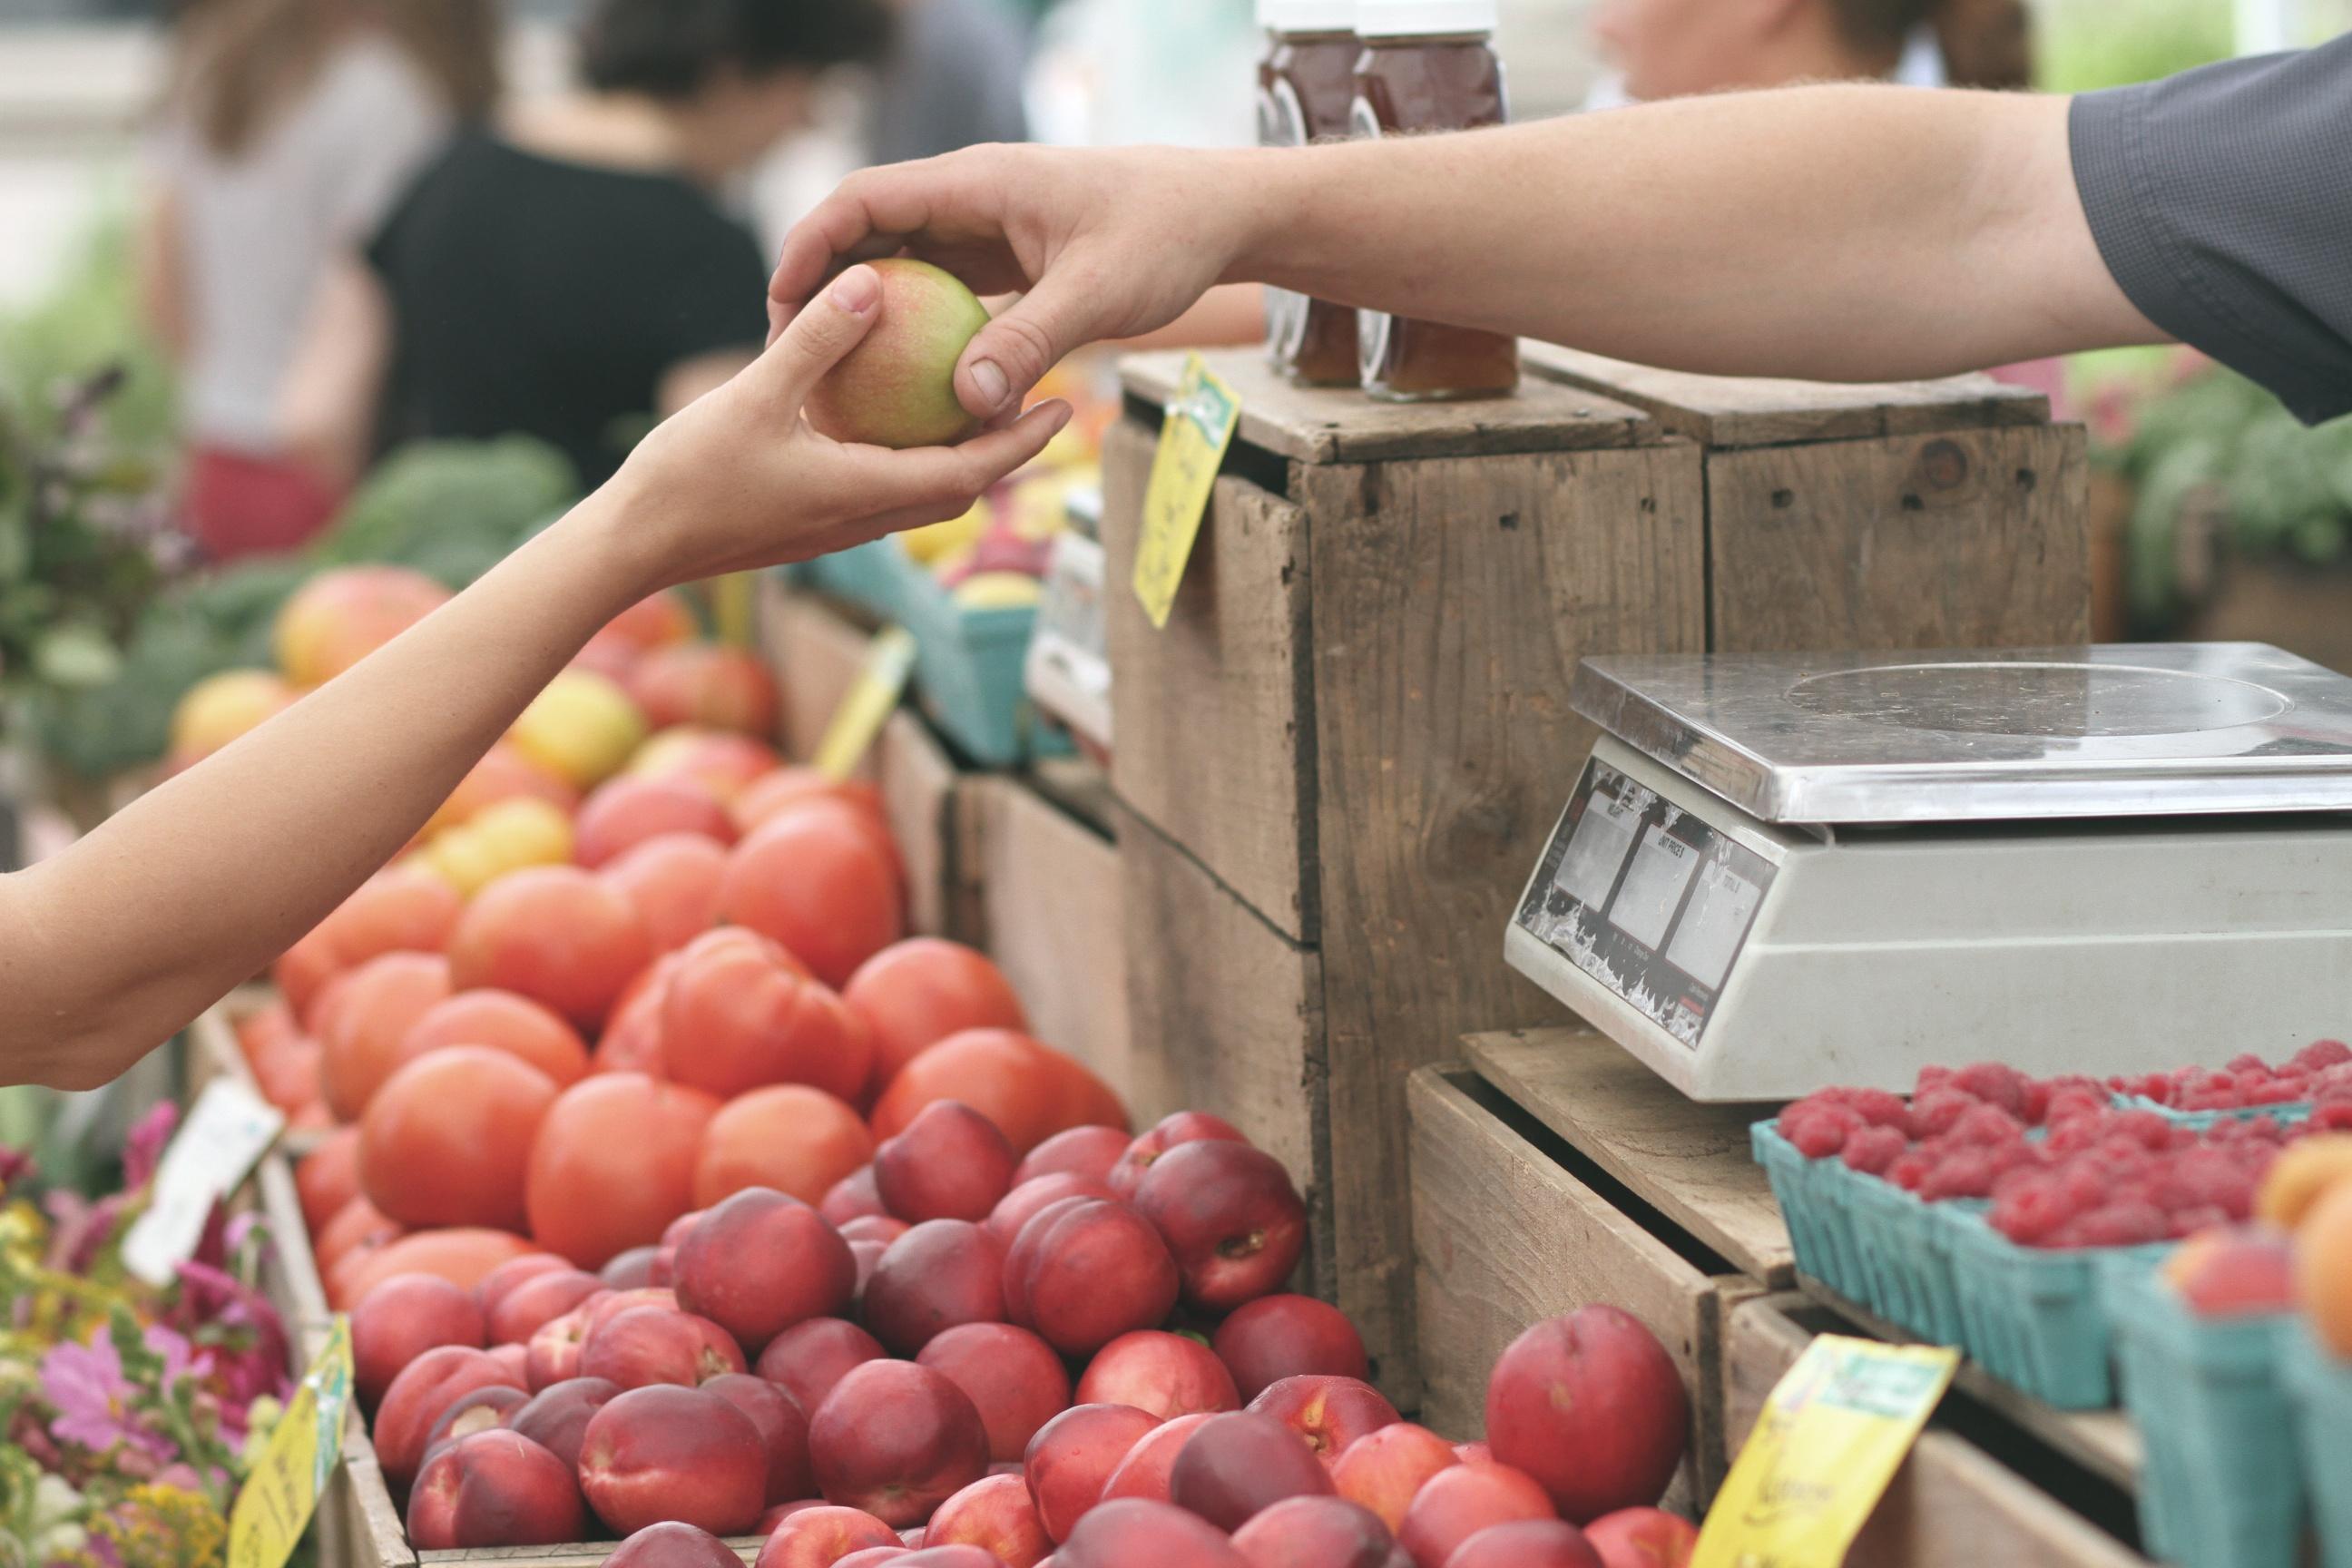 Small Business Saturday Apples Organic Farms Small Business Loans.jpeg